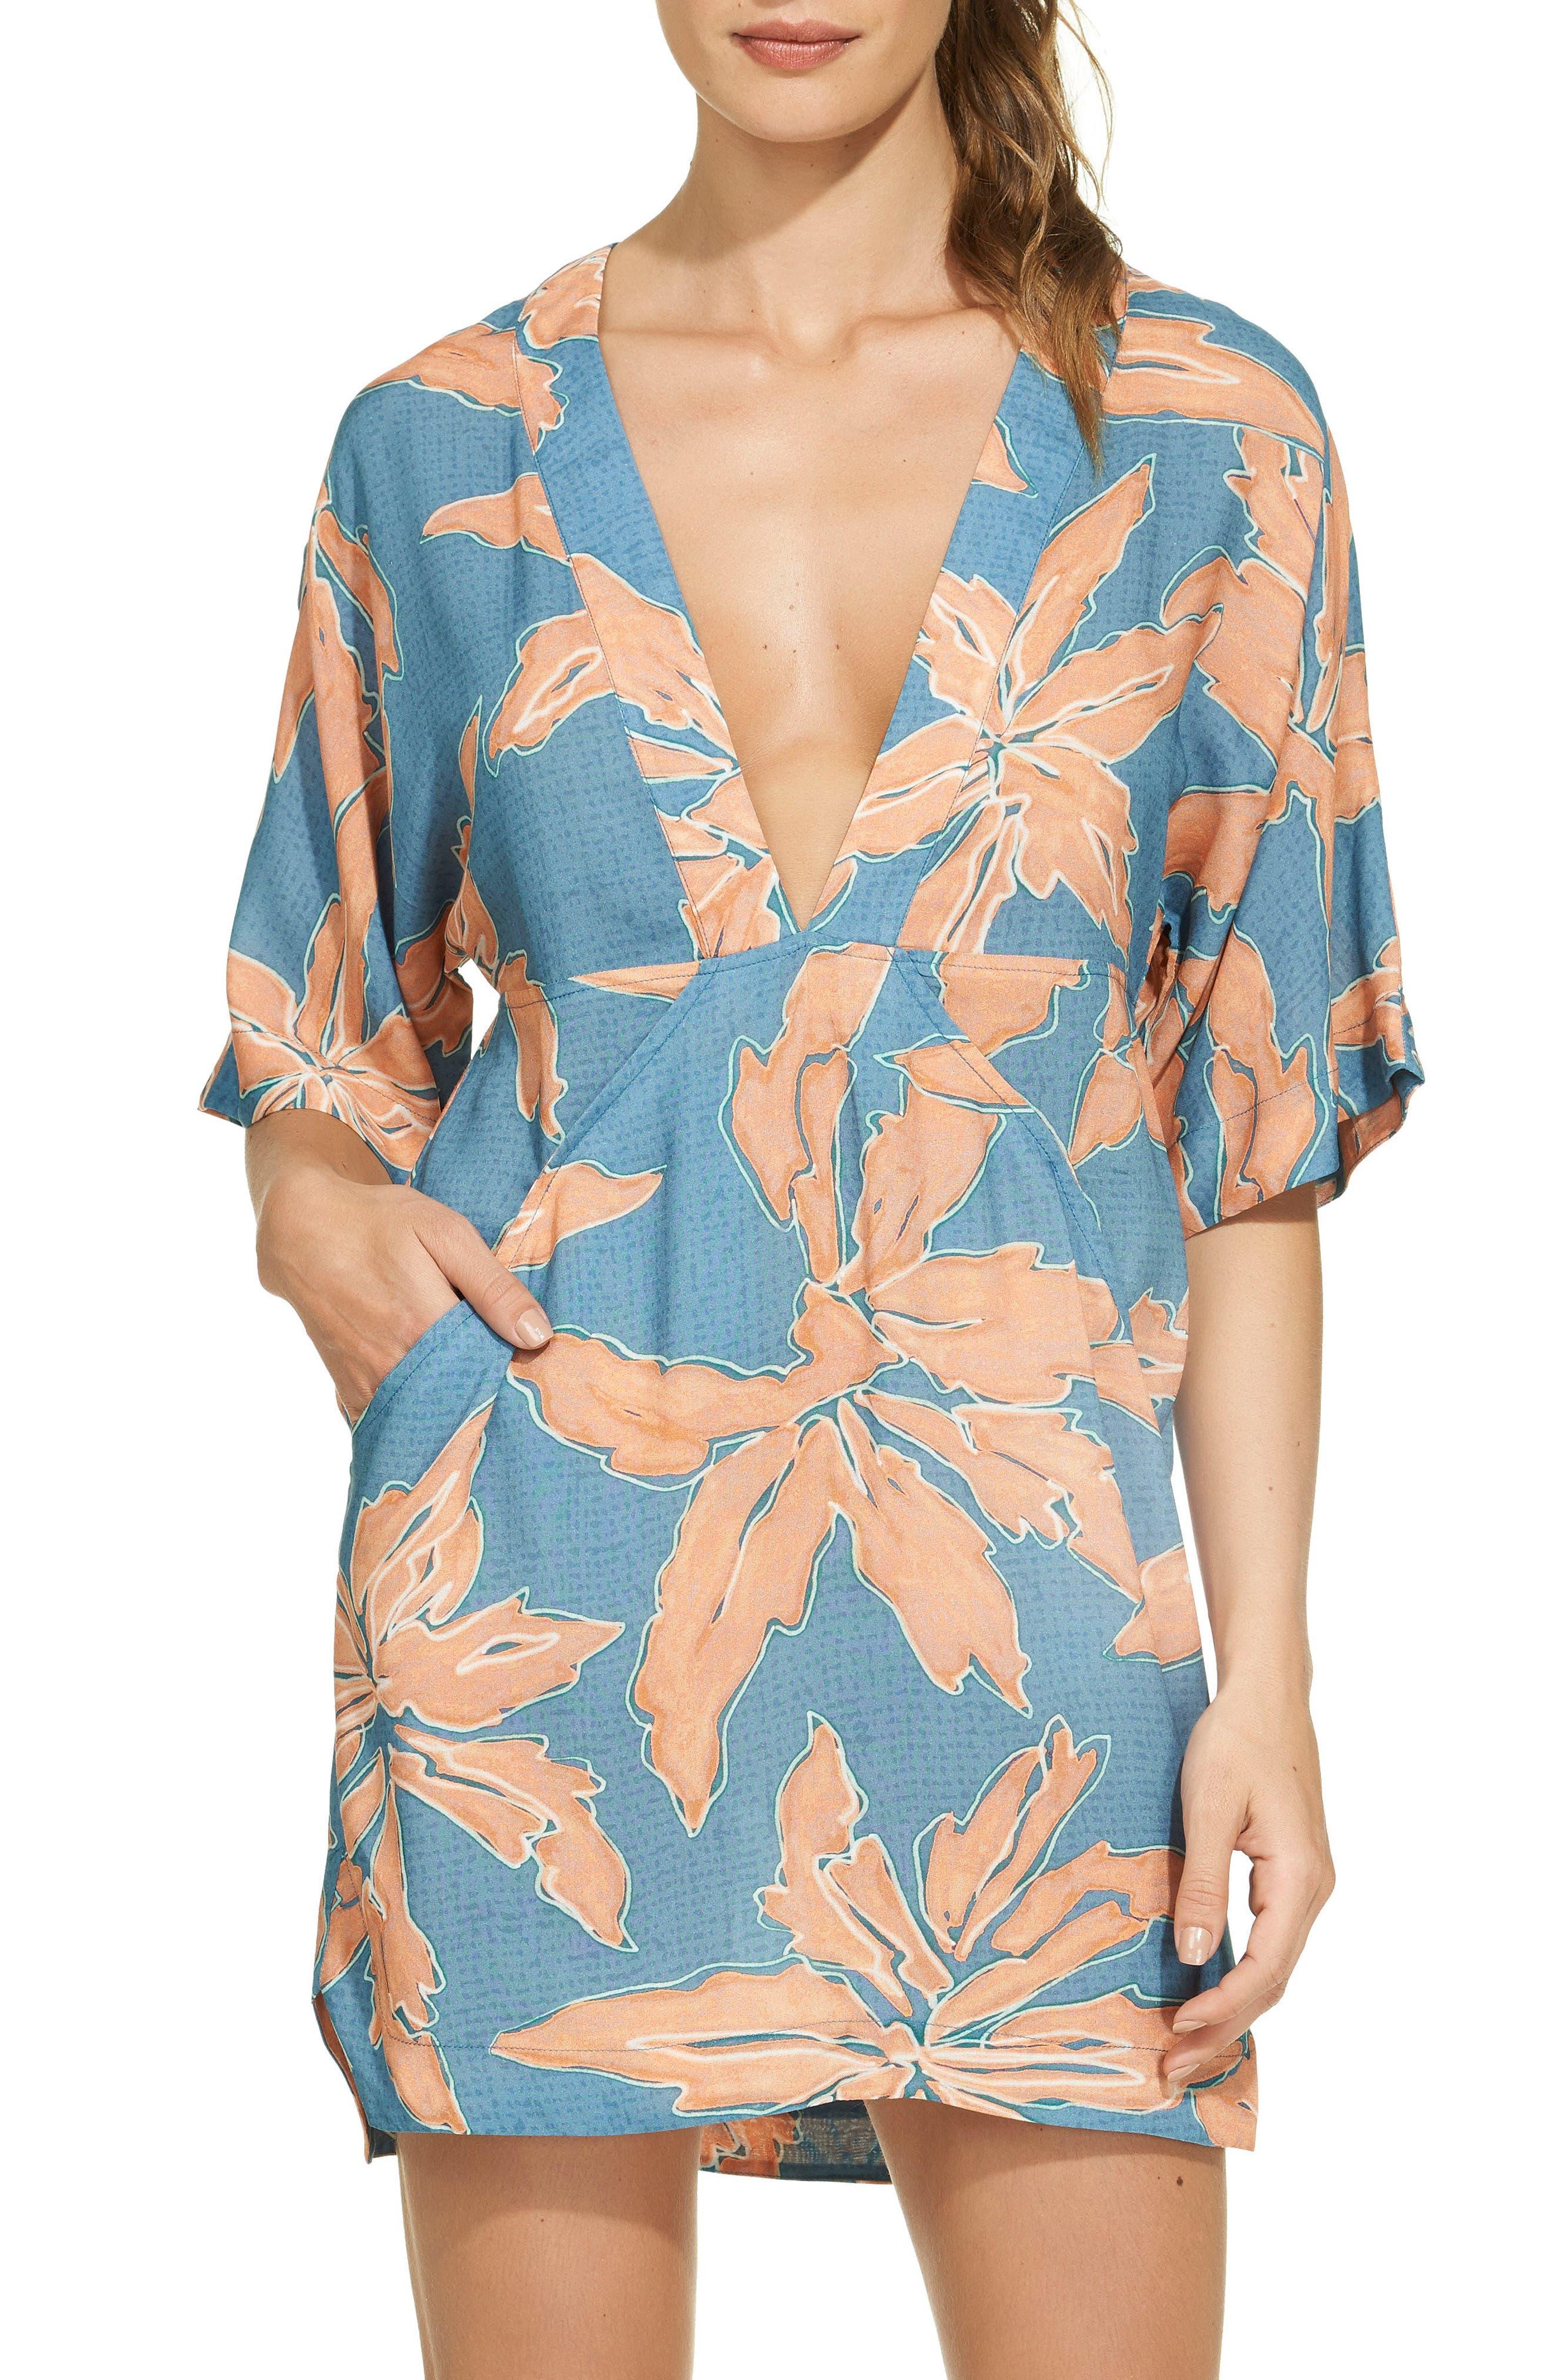 Main Image - ViX Swimwear Margarita Cloe Cover-Up Caftan